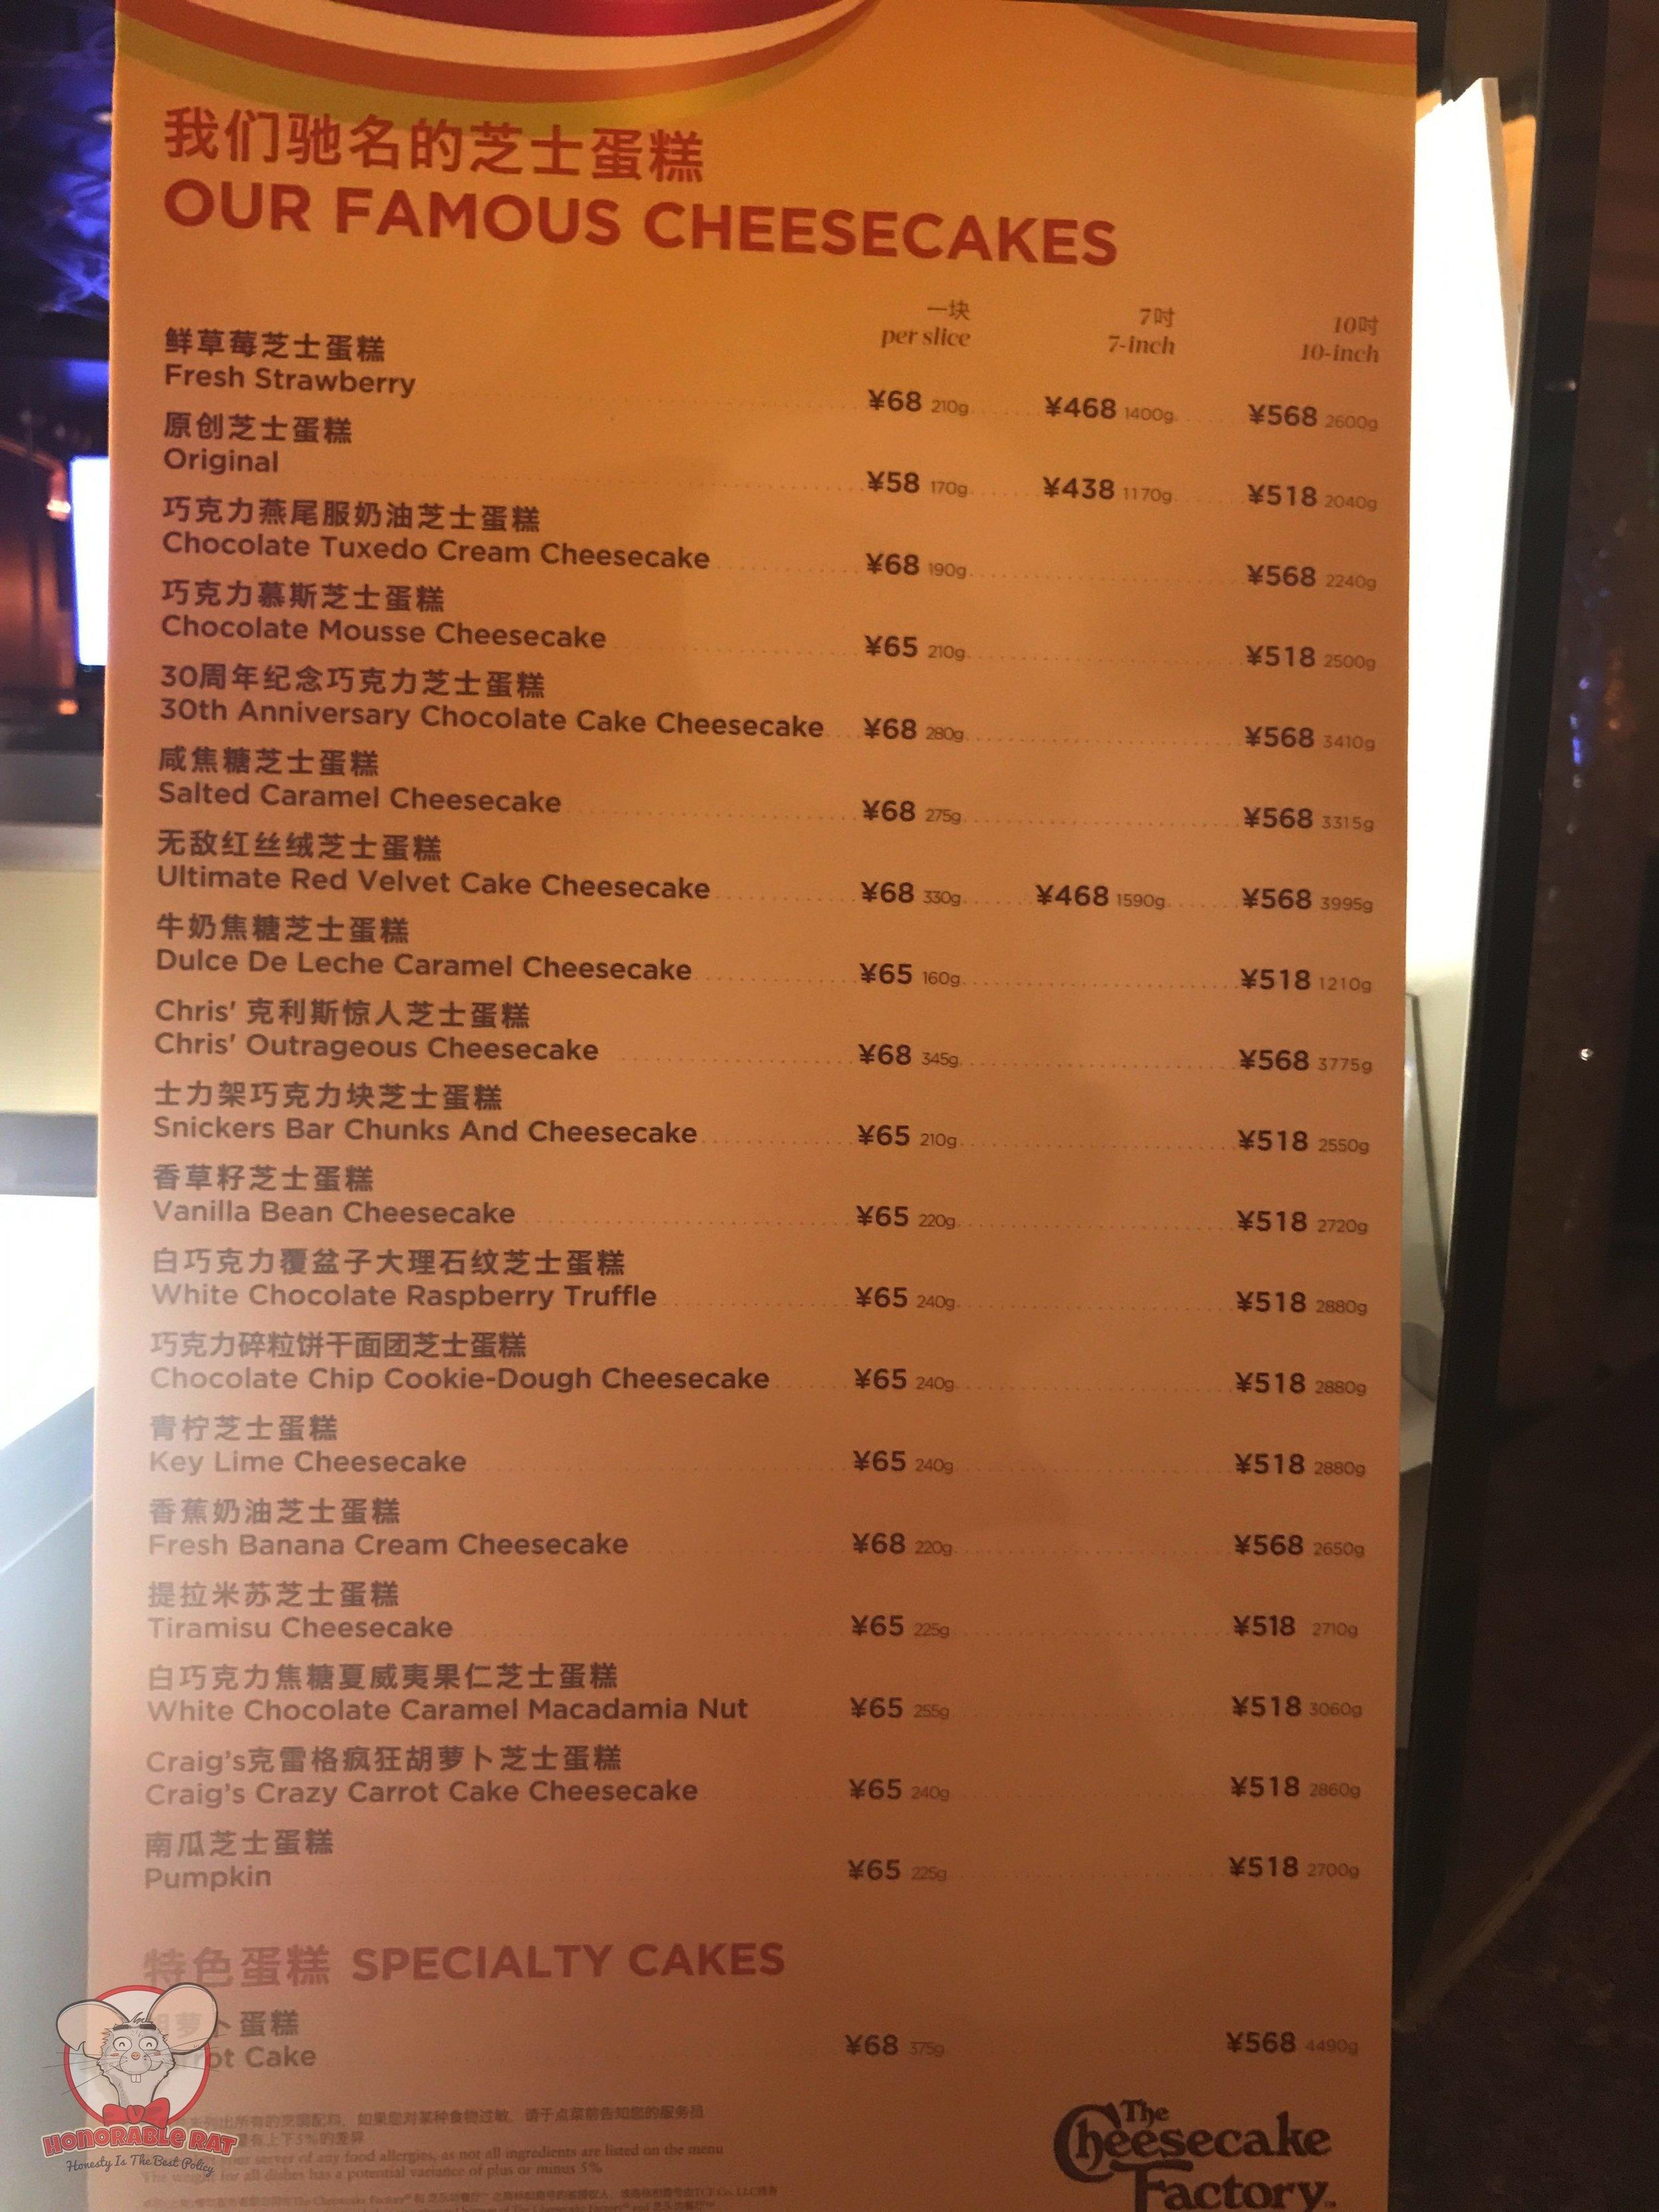 Cheesecake Factory's menu